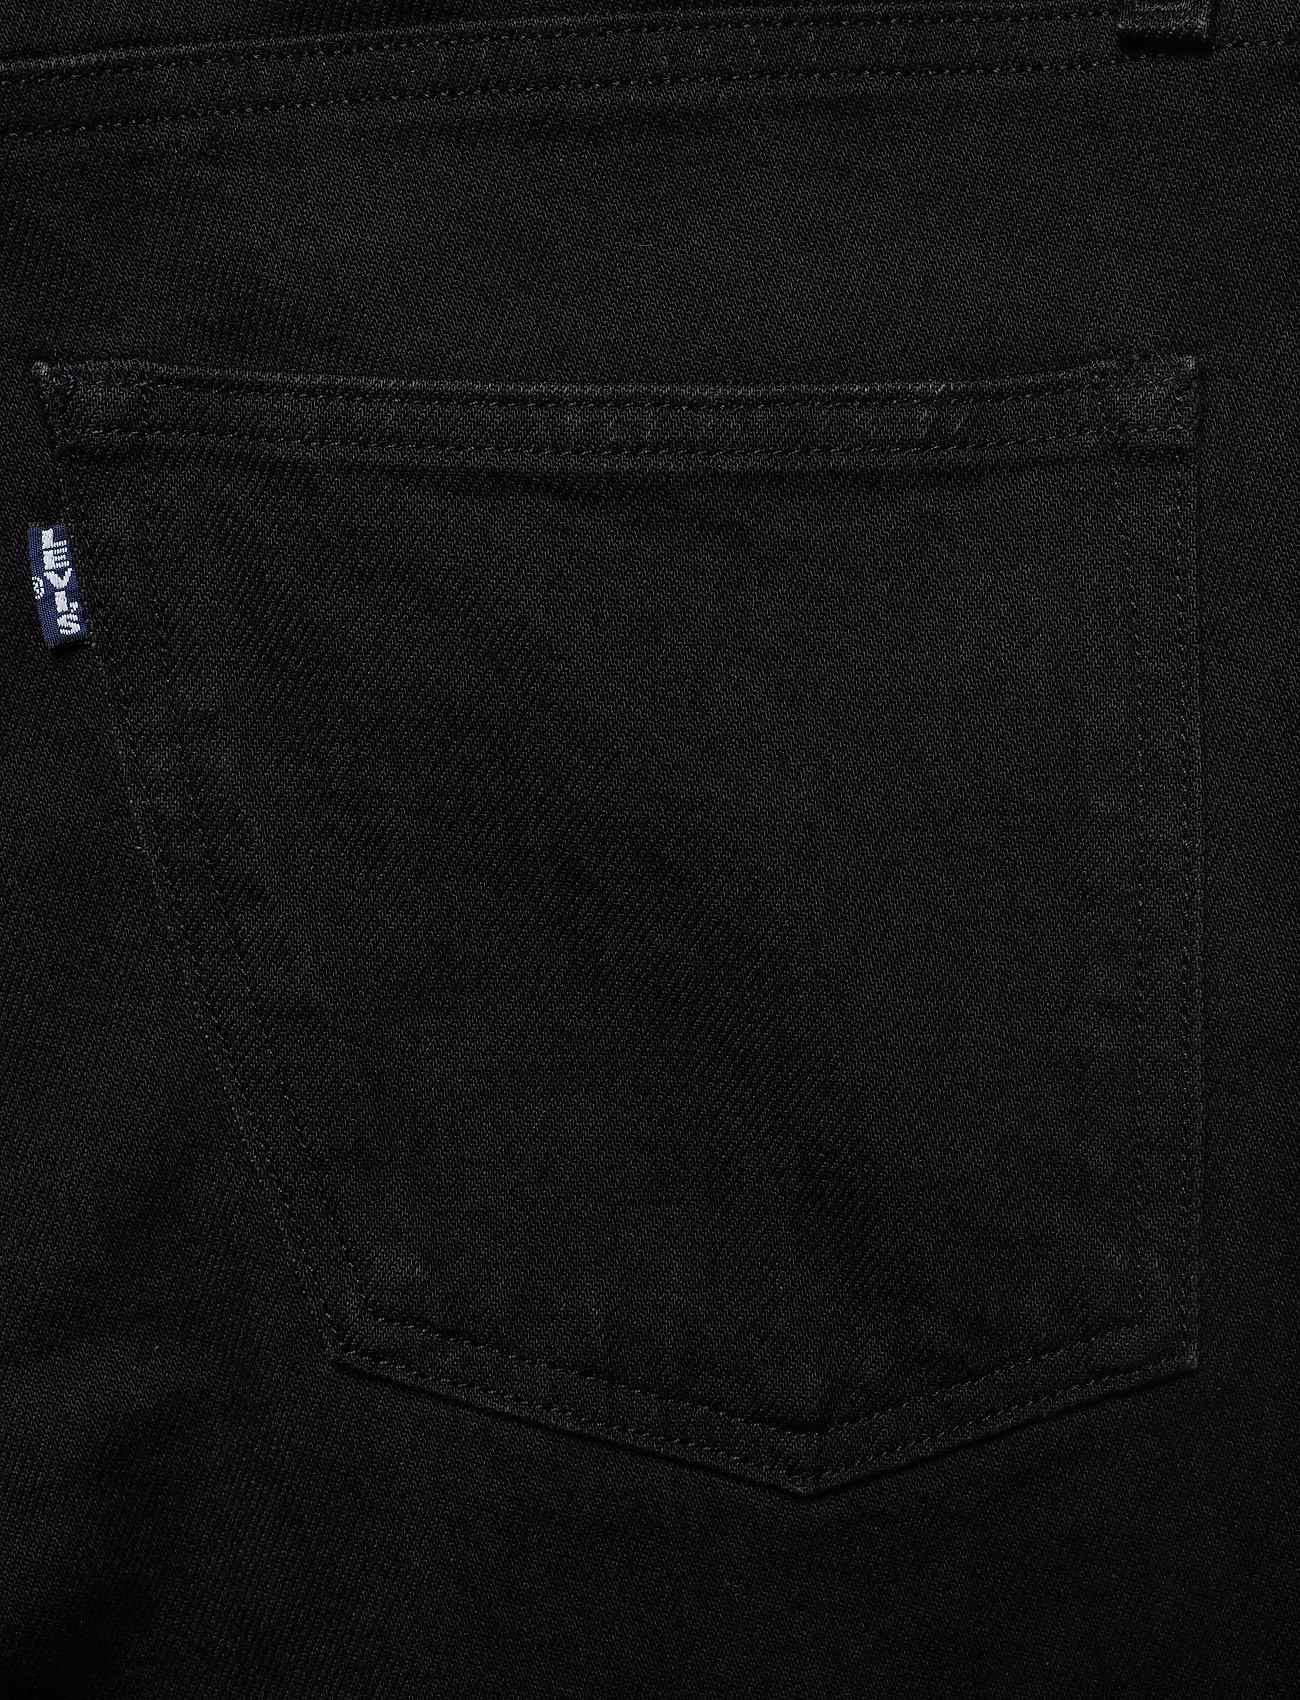 Levi's Made & Crafted - LMC 511 LMC BLACK RINSE 1 - slim jeans - blacks - 4